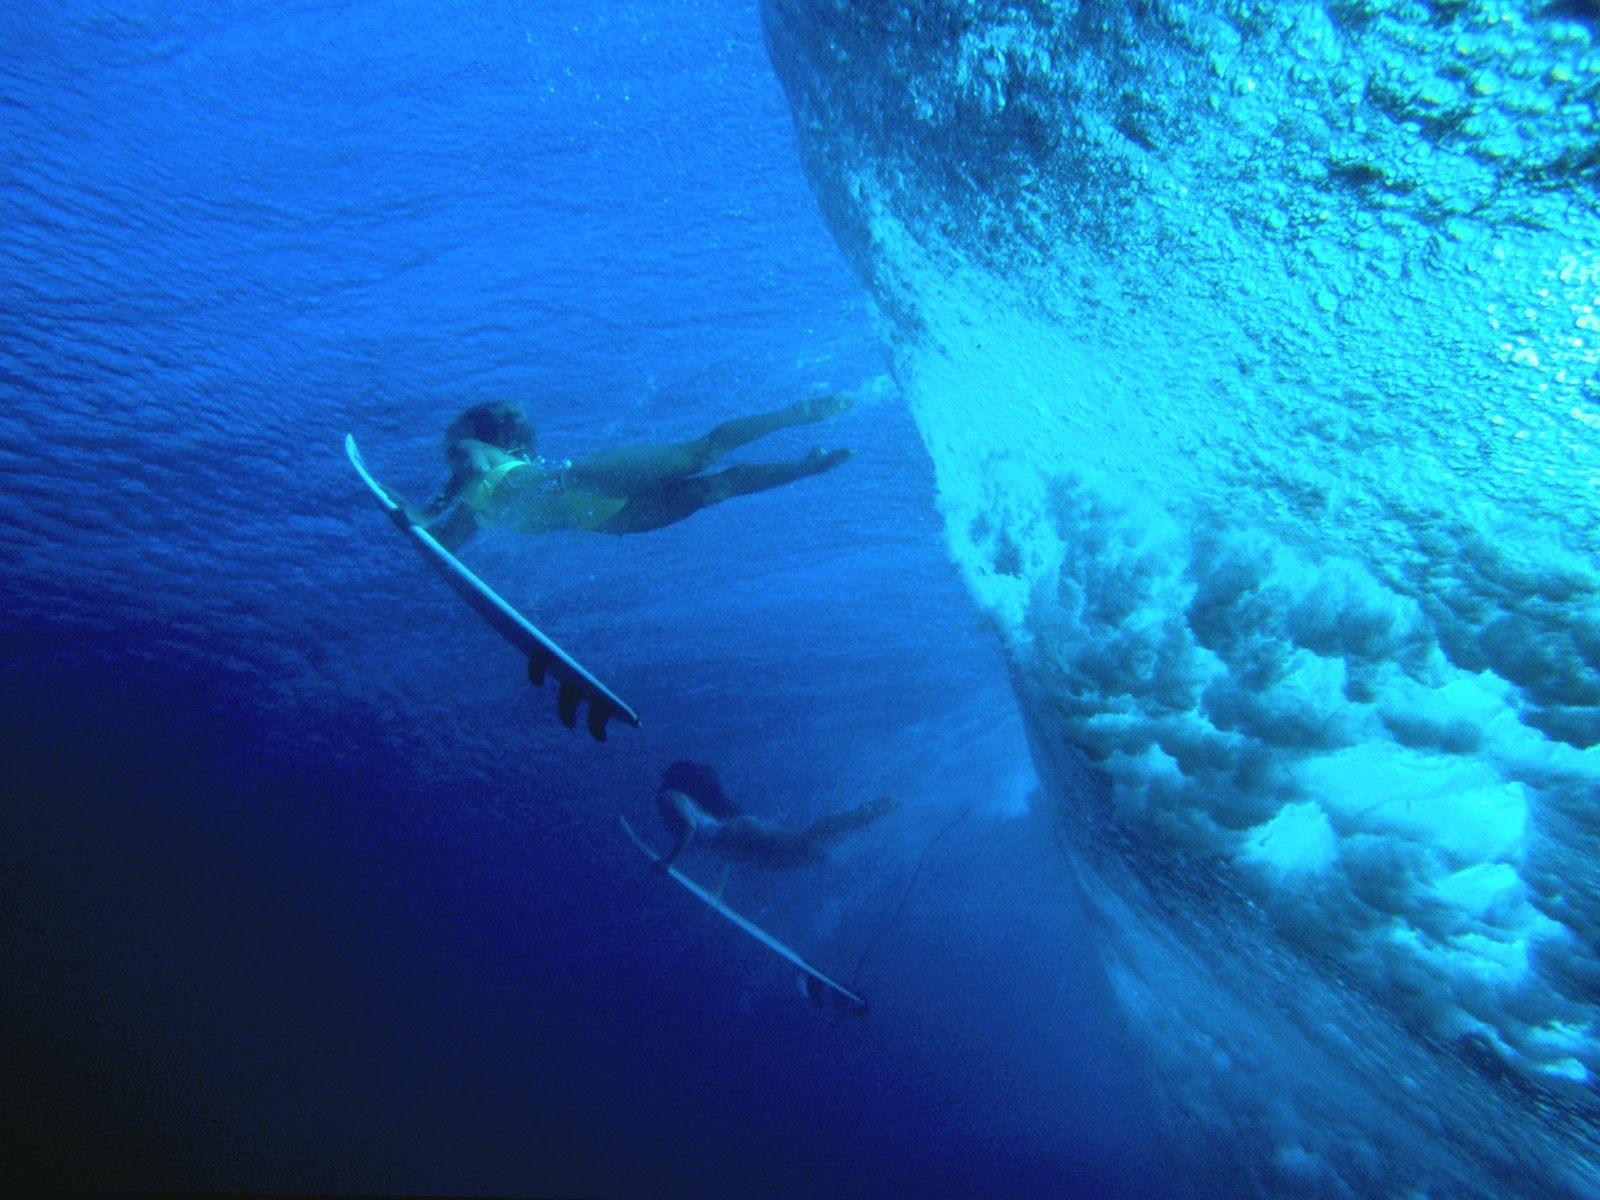 underwater surfer girl desktop - photo #11